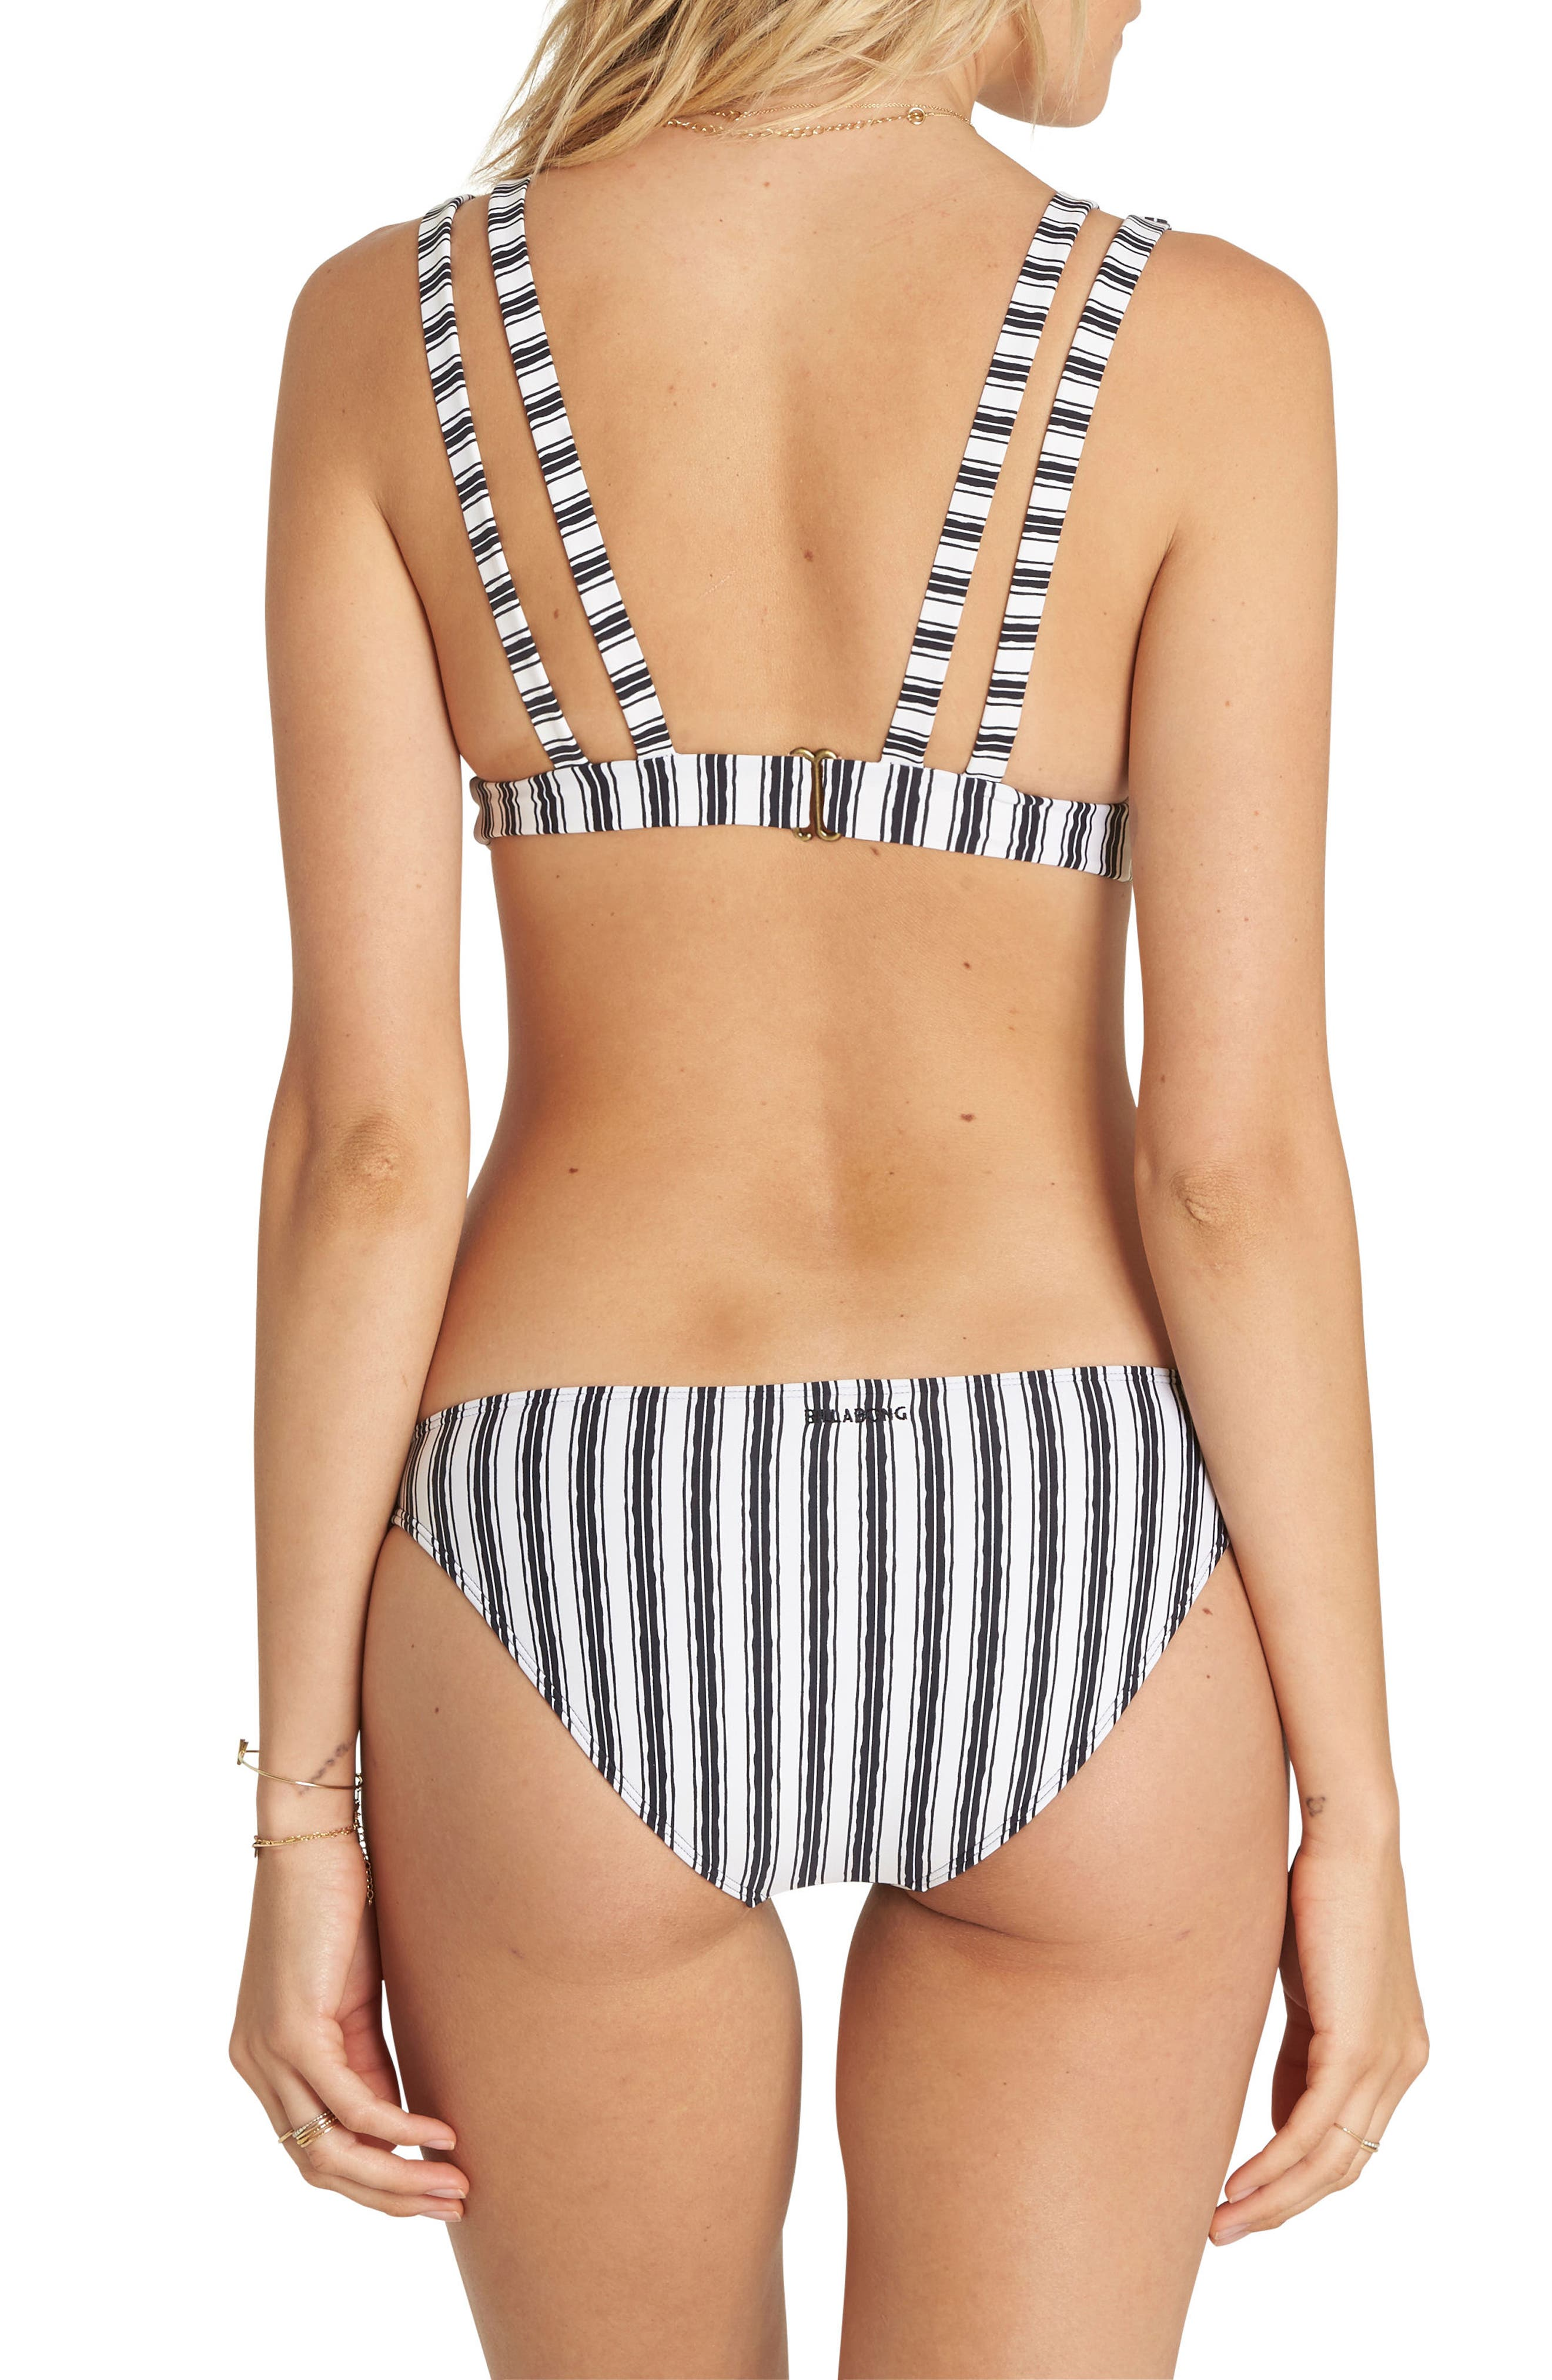 Get in Line Lowrider Bikini Bottoms,                             Alternate thumbnail 4, color,                             001